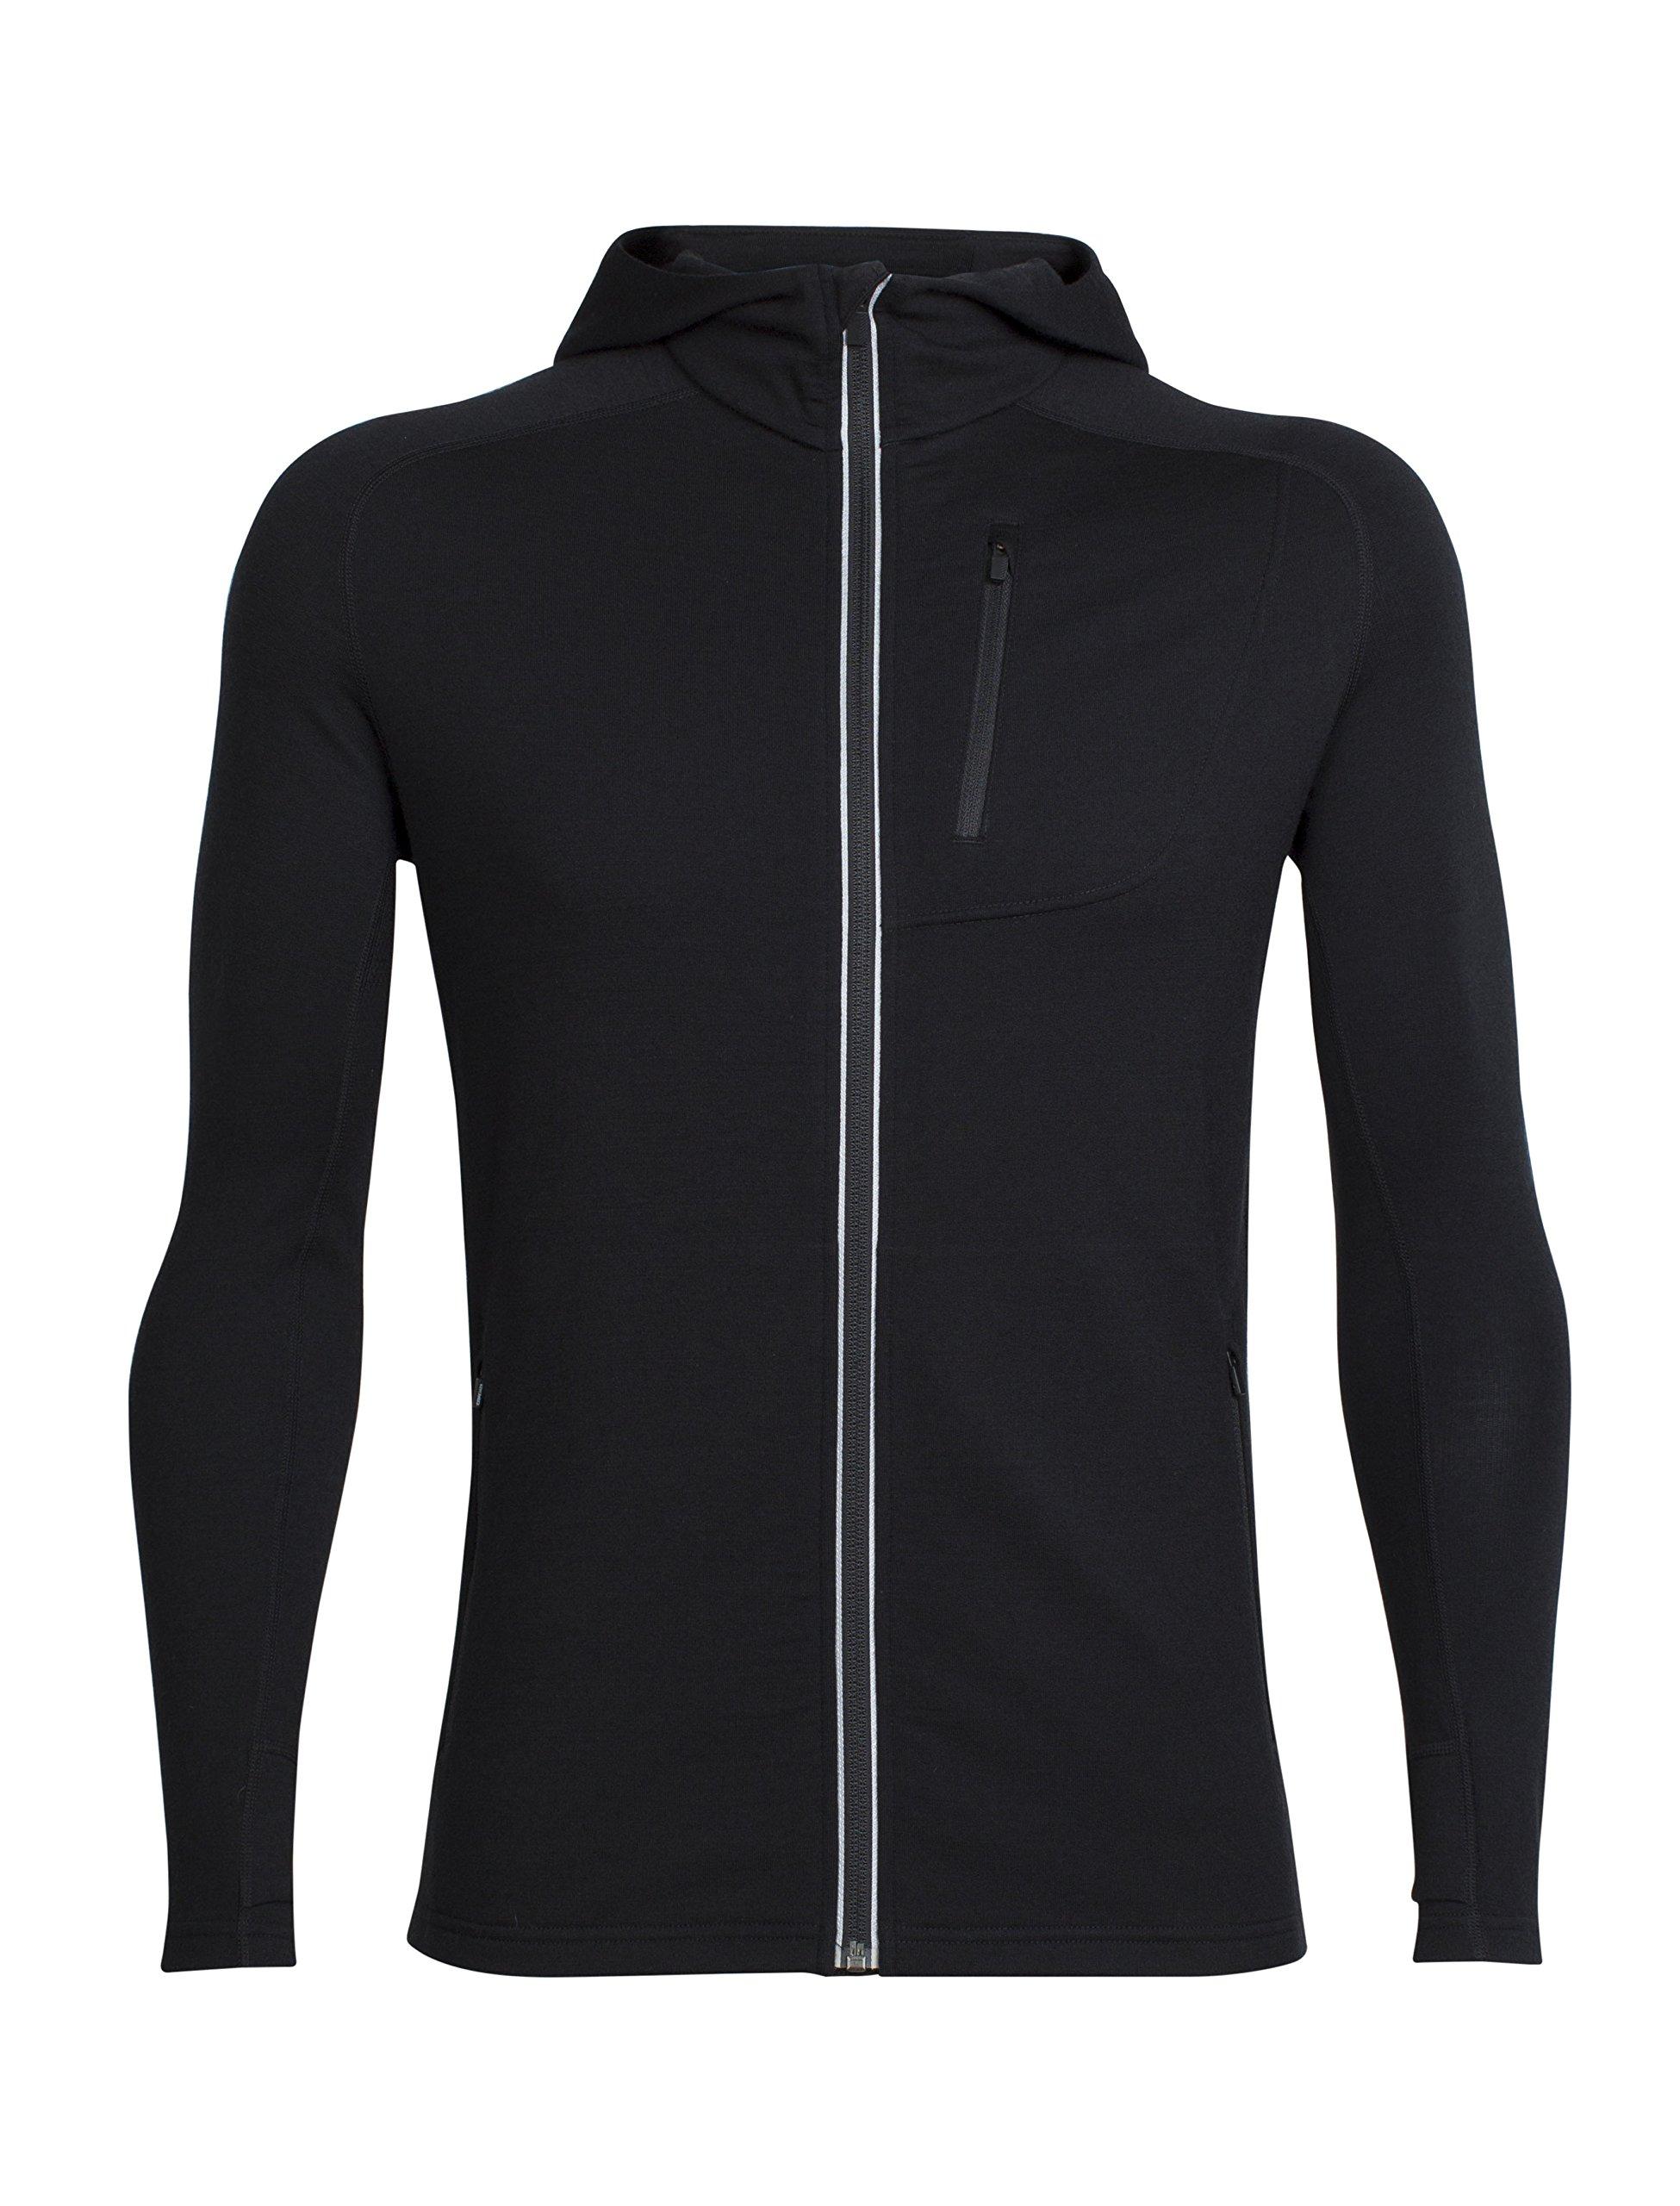 81O782734uL - Icebreaker Men's Quantum Long Sleeve Zip Hood Cover Ups